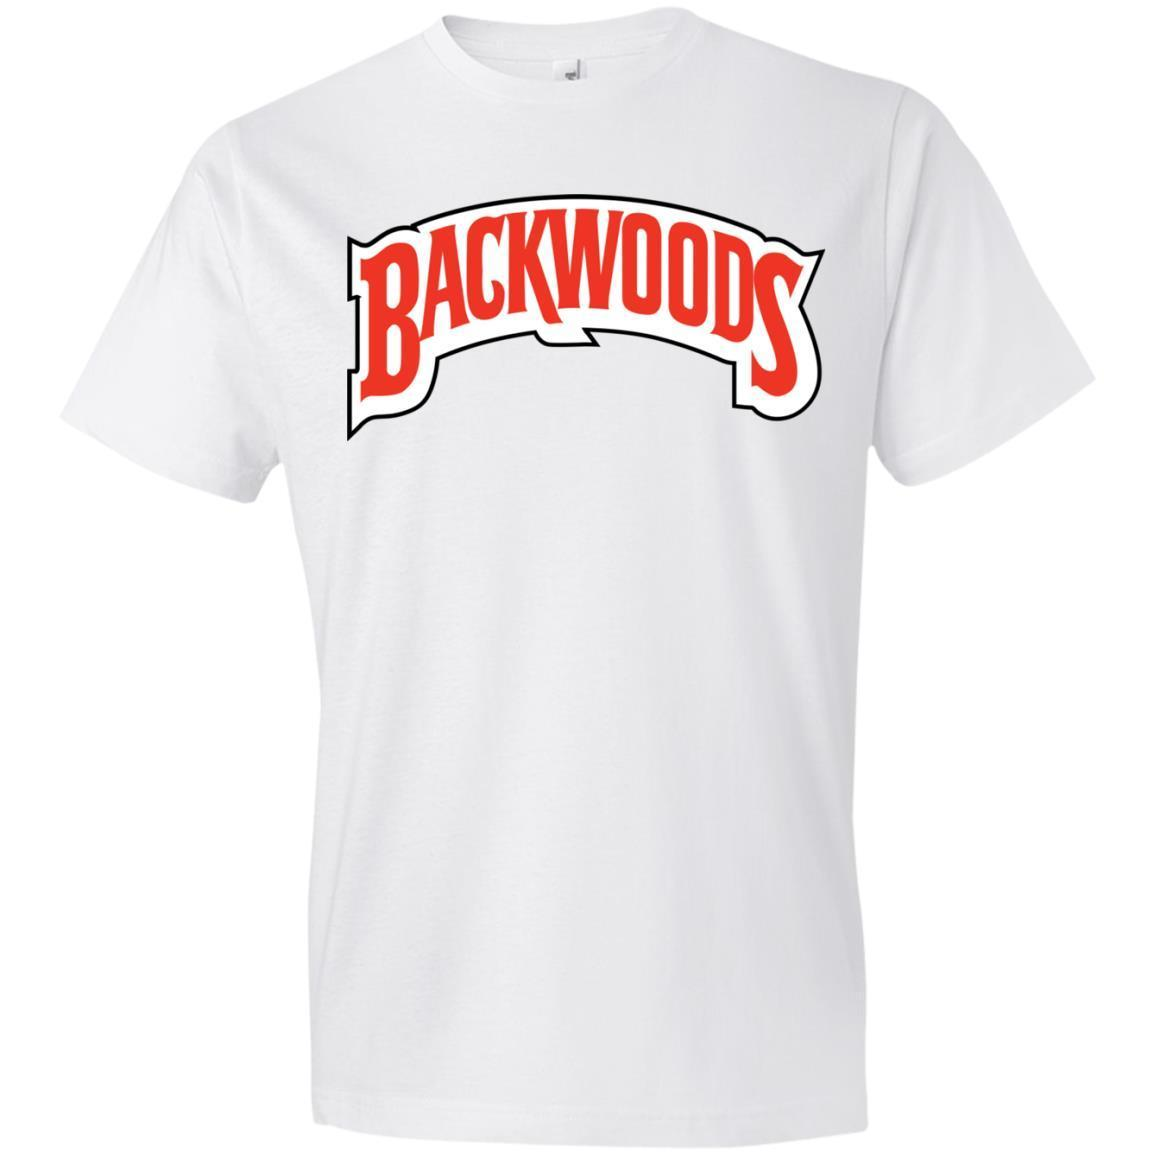 Backwoods – Anvil T-Shirt